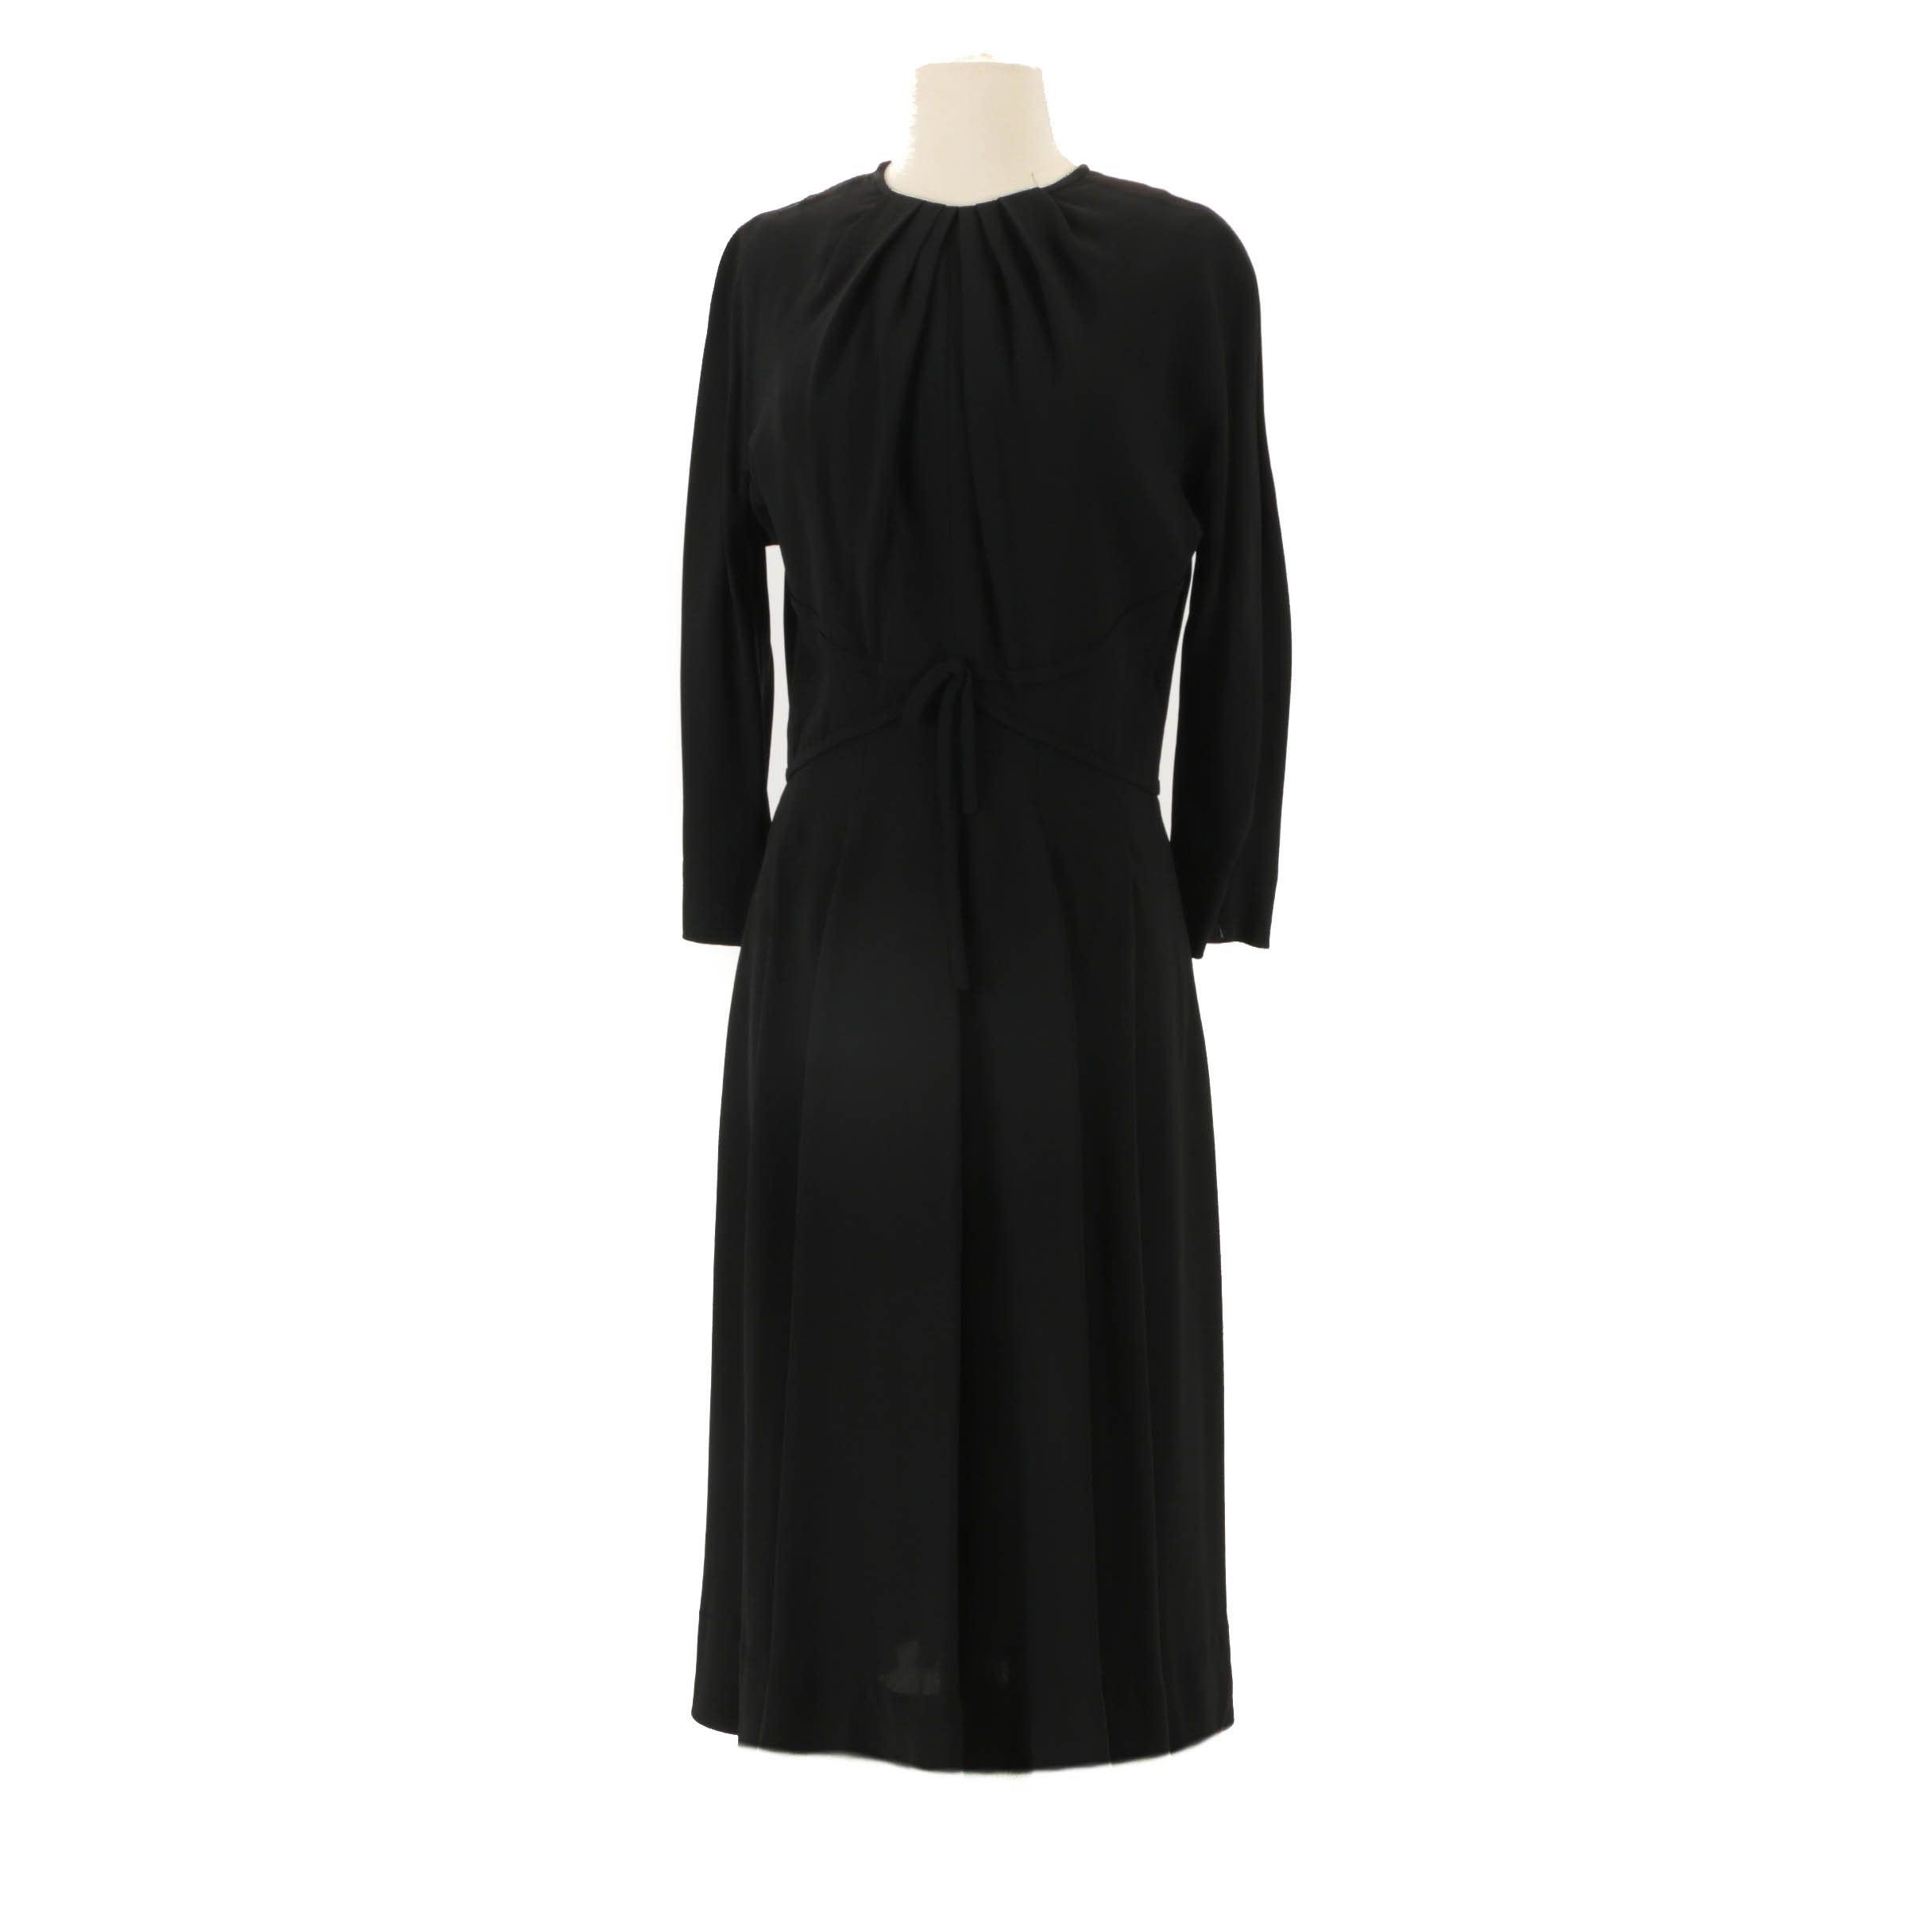 Circa 1950s Vintage Herbert Sondheim Gabardine Dress